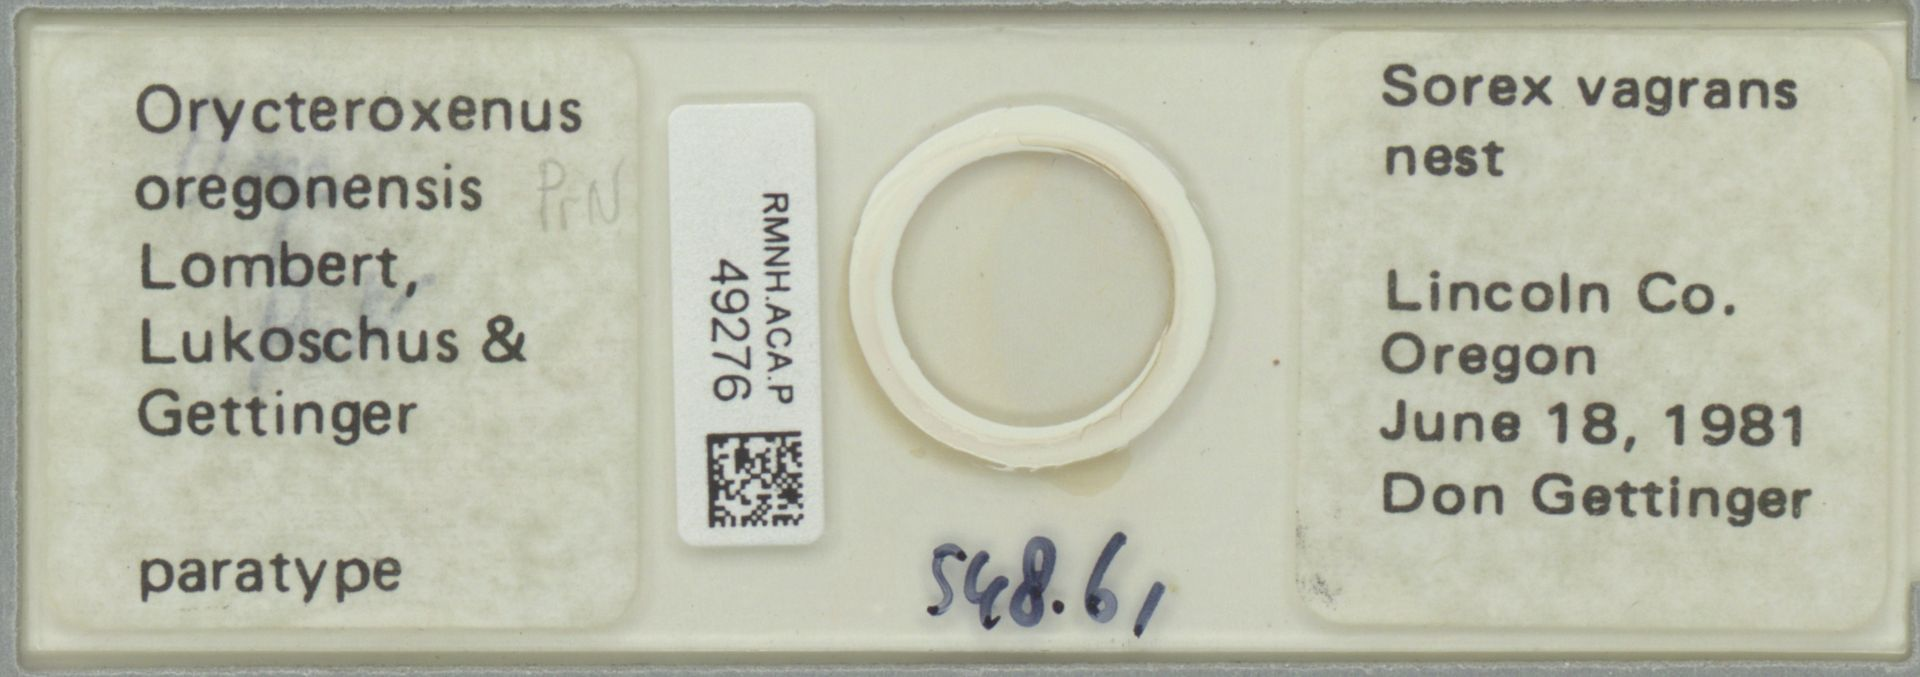 RMNH.ACA.P.49276 | Orycteroxenus oregonensis Lombert, Lukoschus & Gettinger